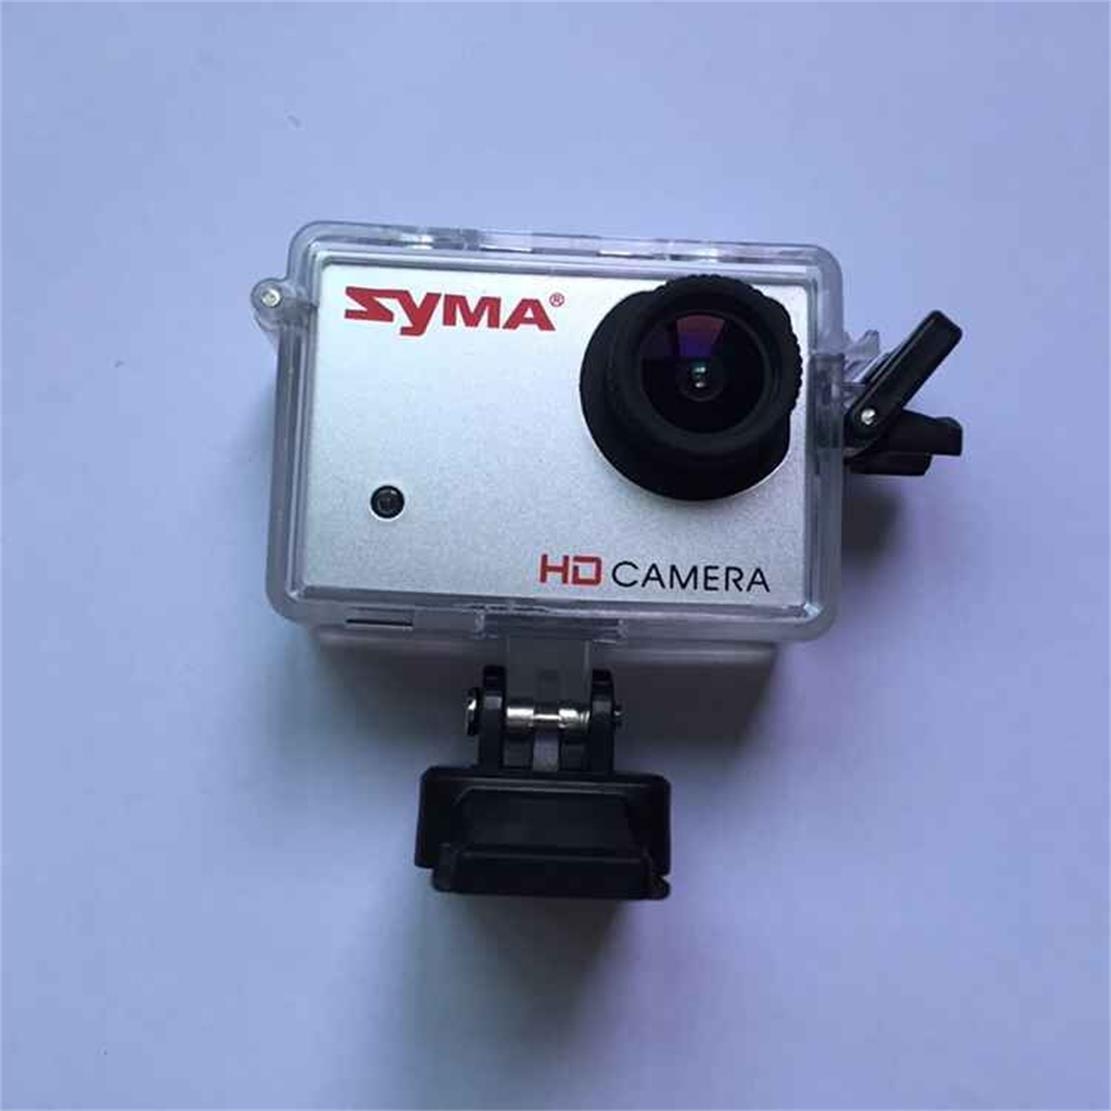 X8G 8mp Камера Для SYMA Rc Дроны Камера Hd Аксессуары Вертолет Запчасти Quadcopter Комплекты